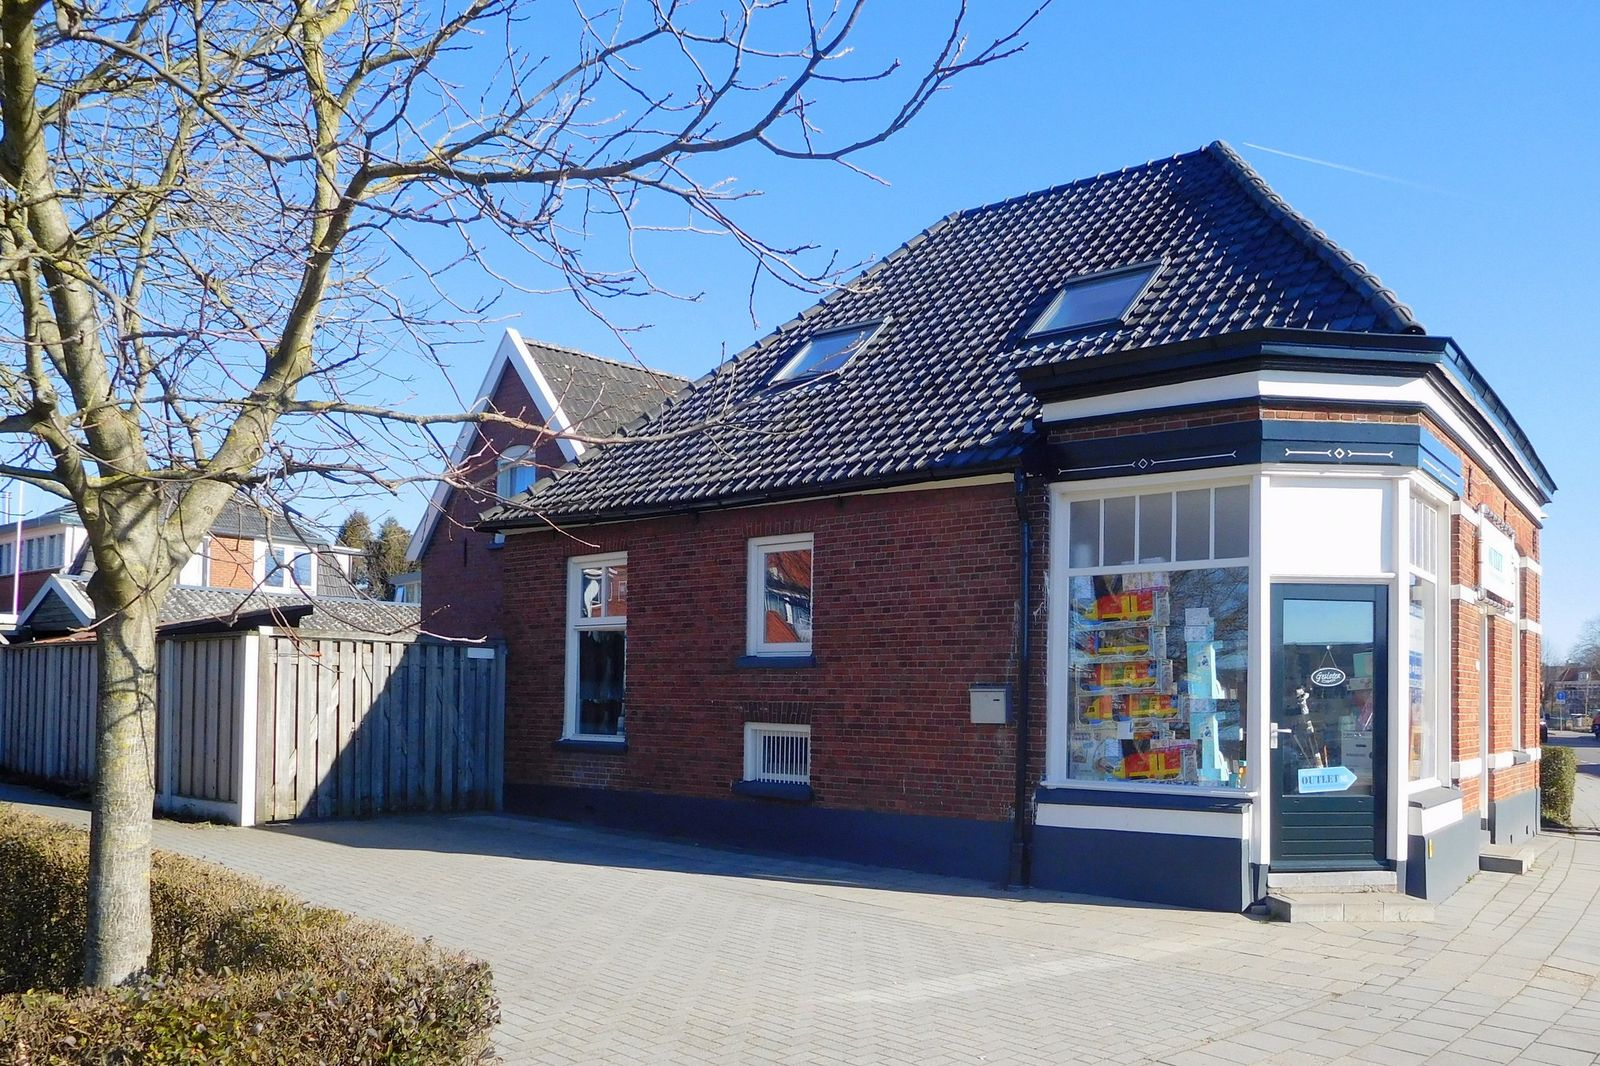 Misterweg 30, Winterswijk